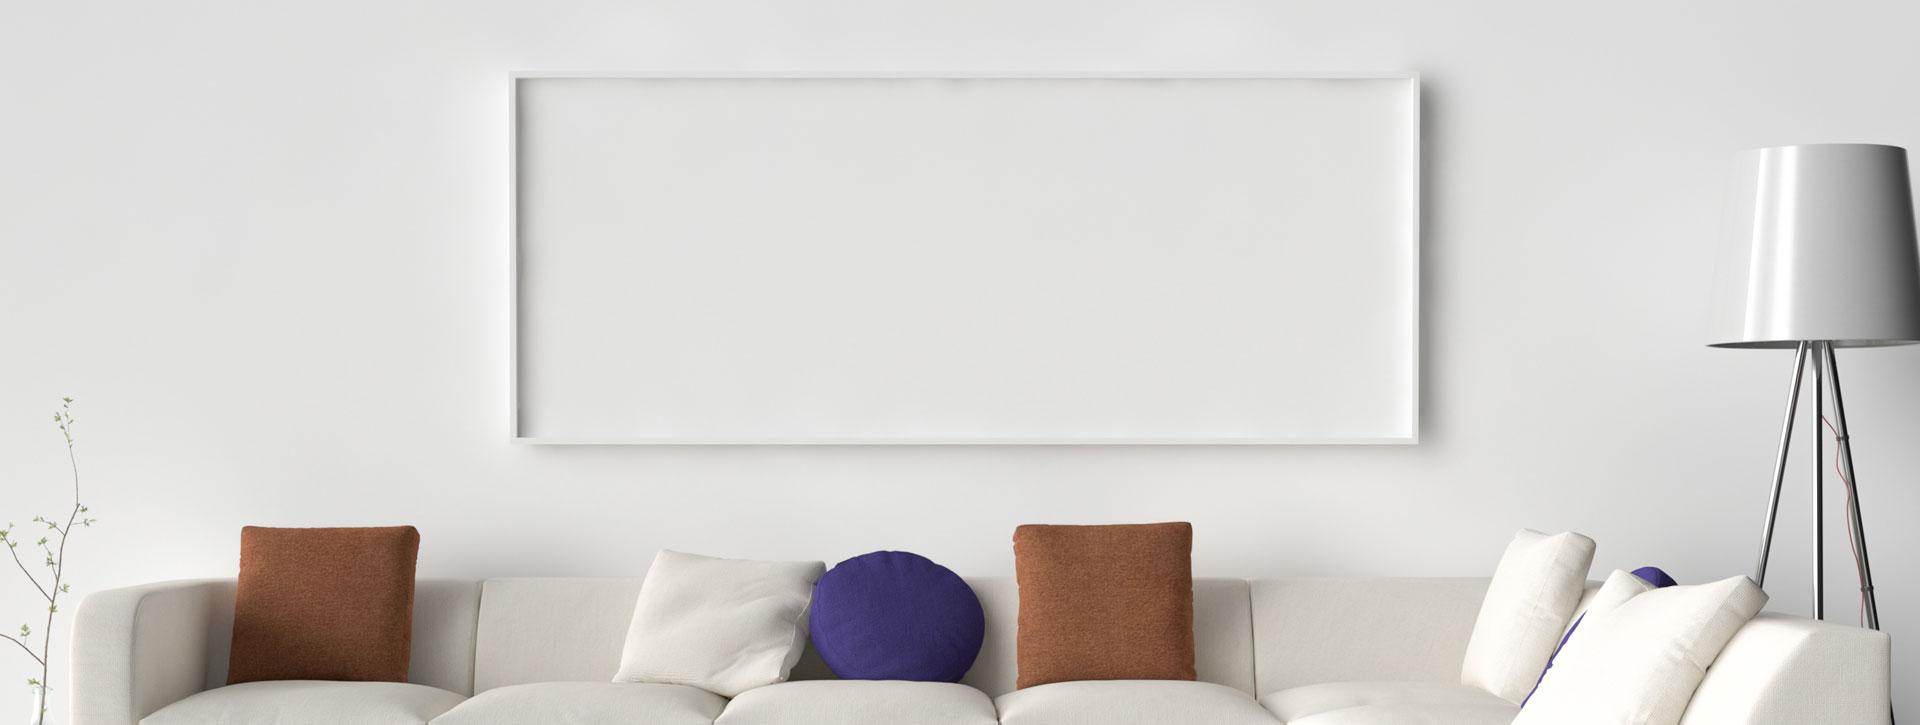 fotolabor darmstadt analog und digital fotogena bilderwelt. Black Bedroom Furniture Sets. Home Design Ideas